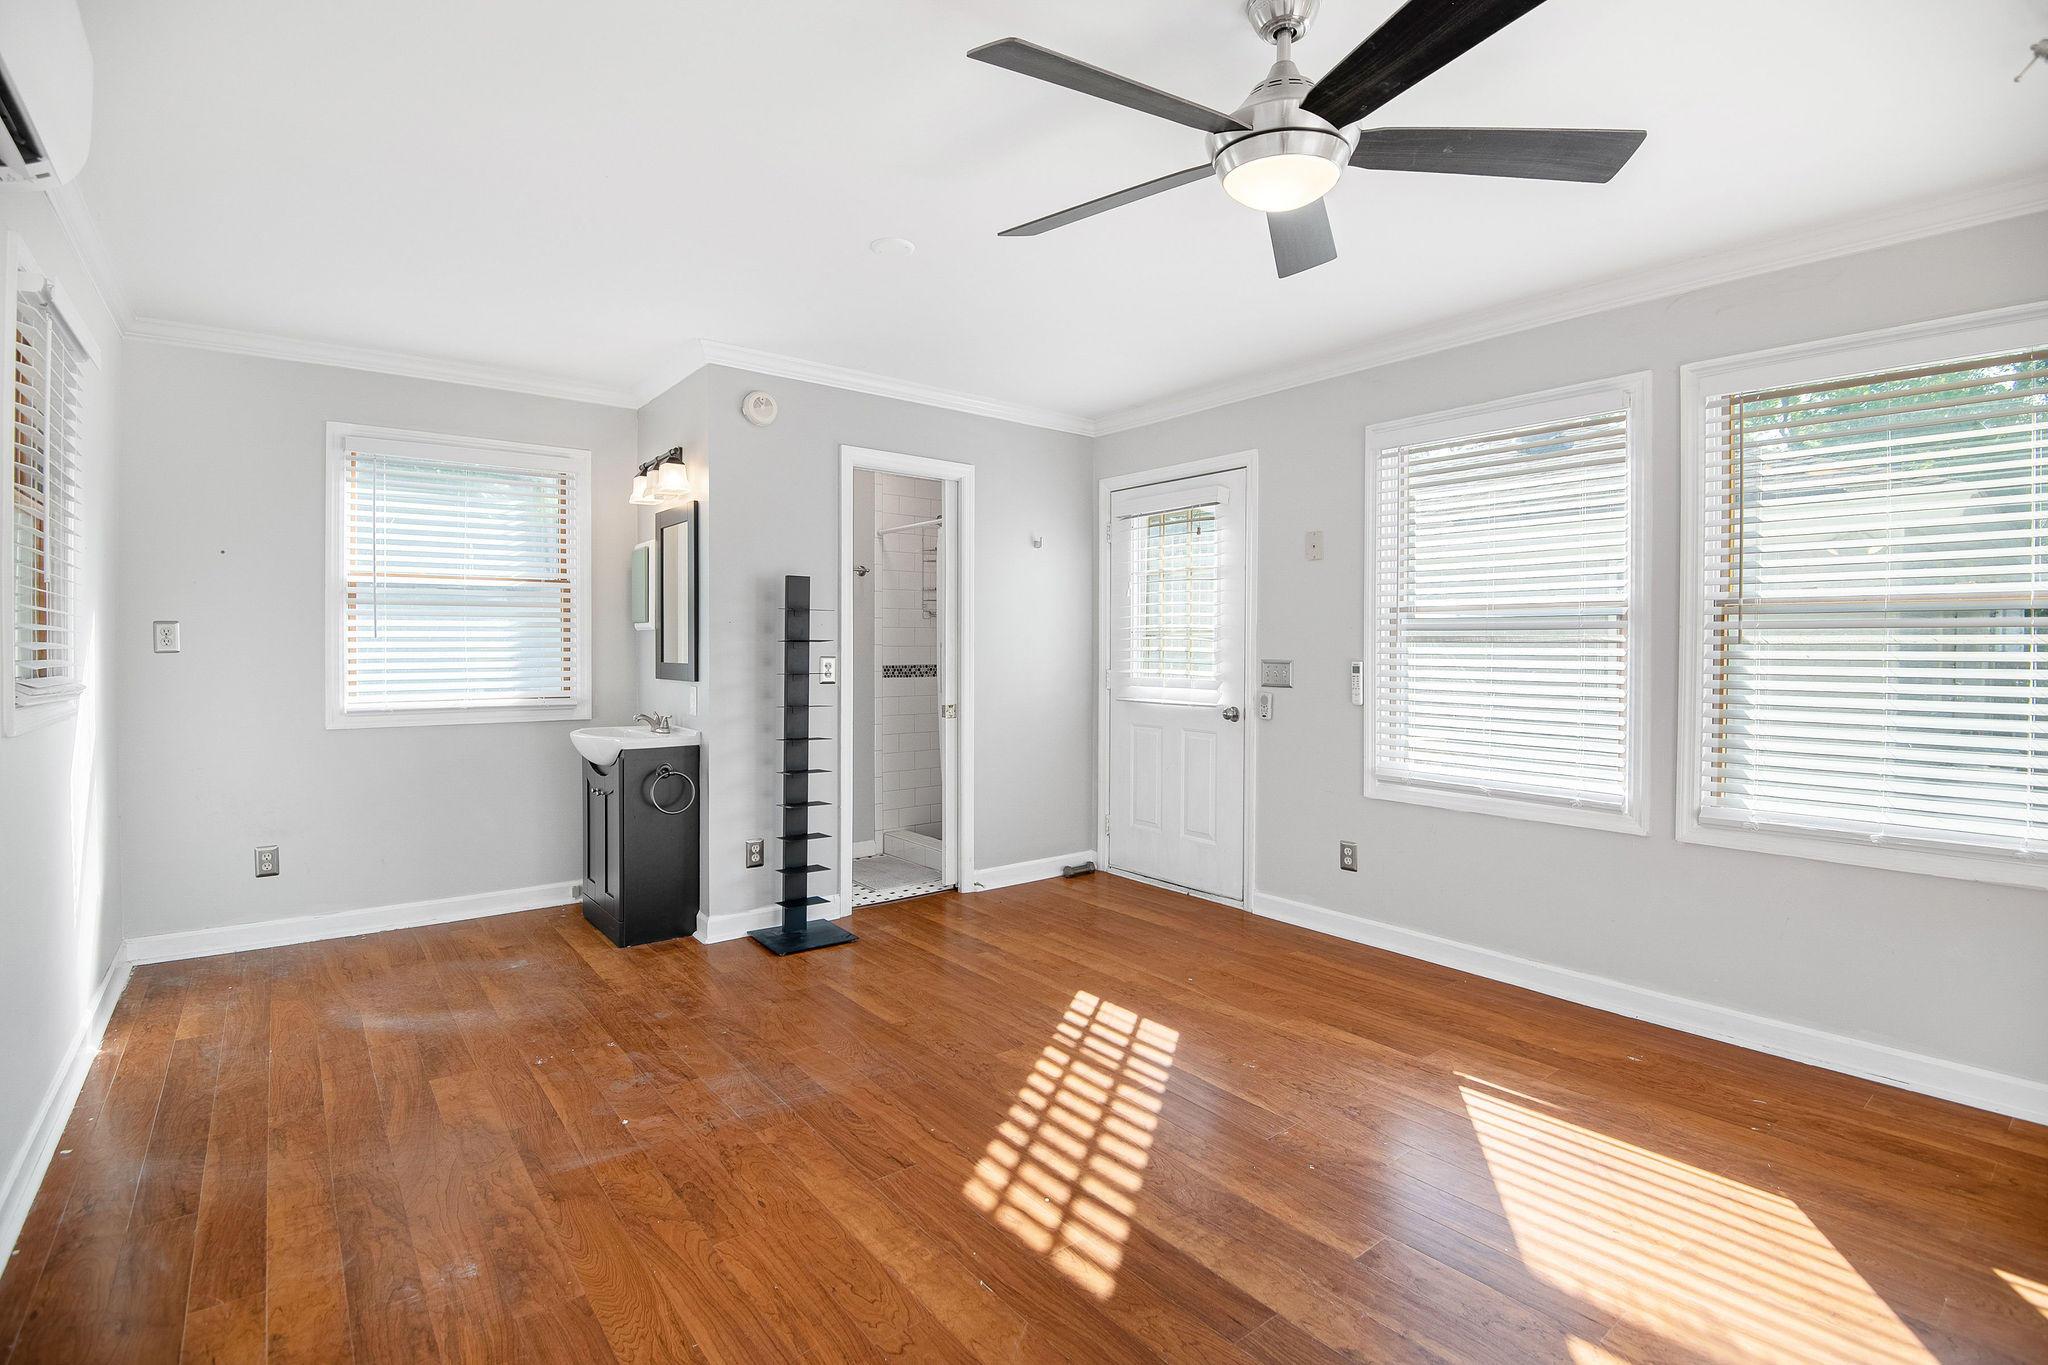 Old Mt Pleasant Homes For Sale - 914 Center, Mount Pleasant, SC - 15